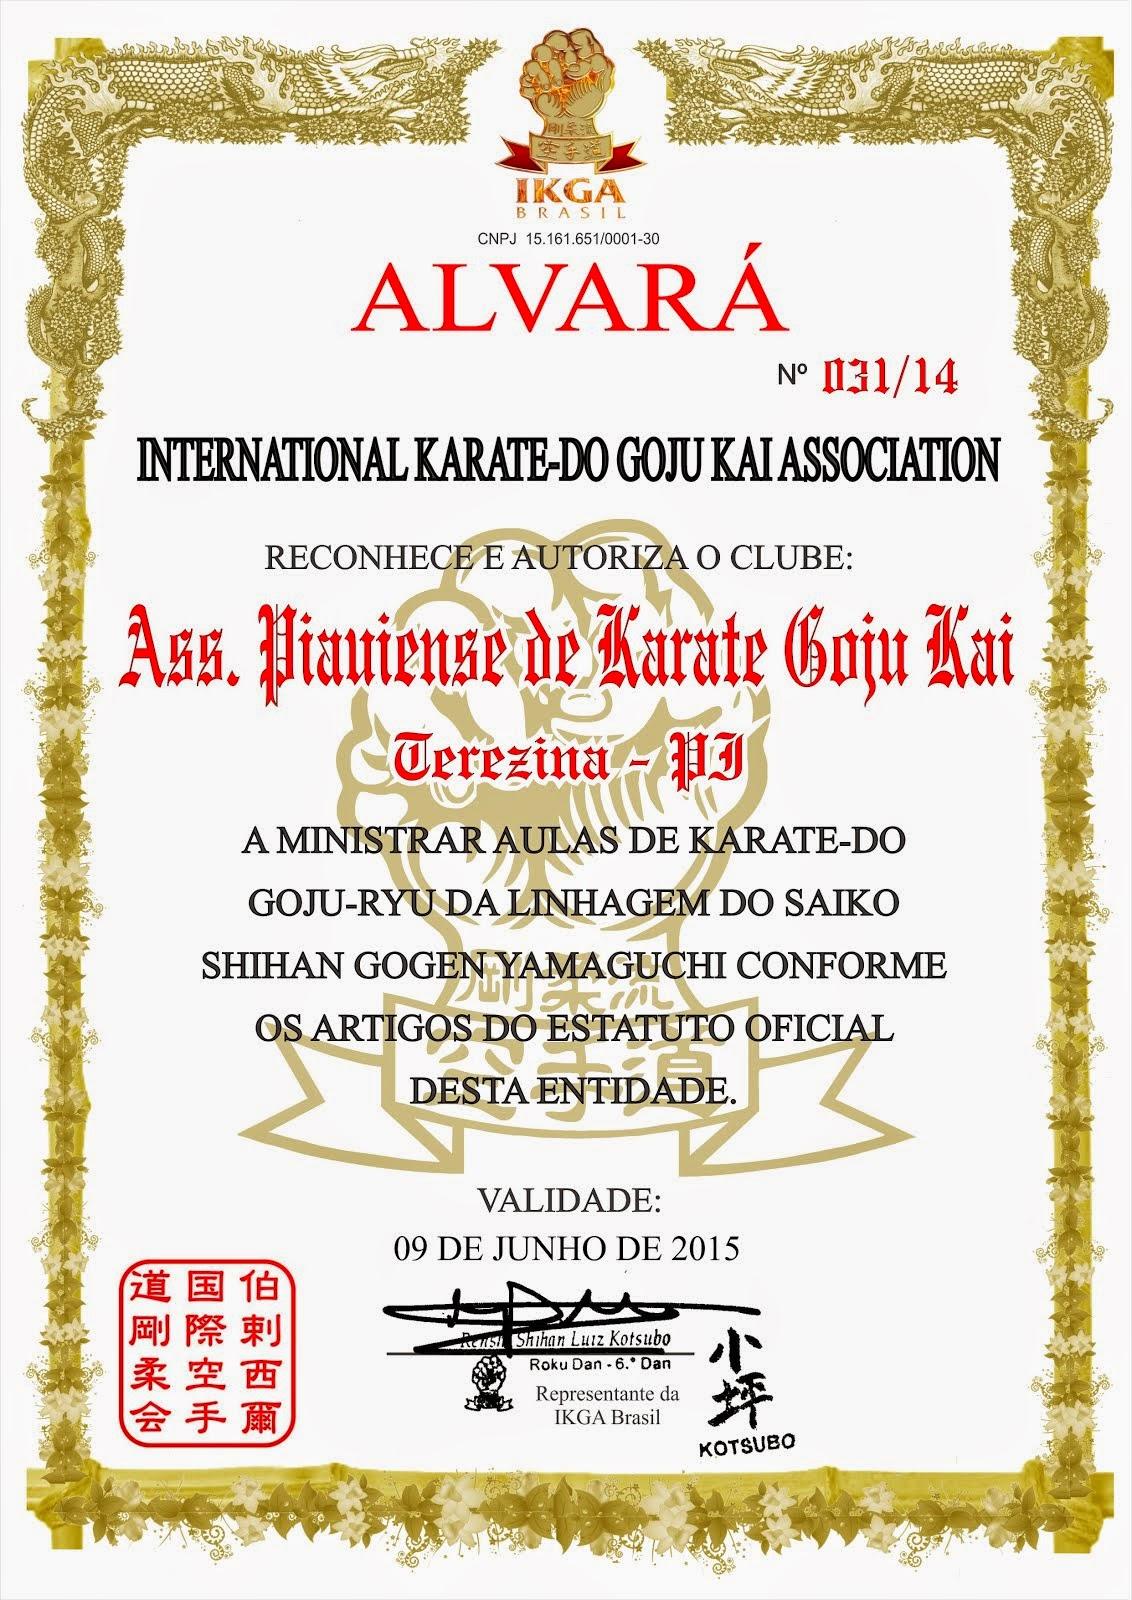 ALVARÁ DE FUNCIONAMENTO - IKGABRASIL